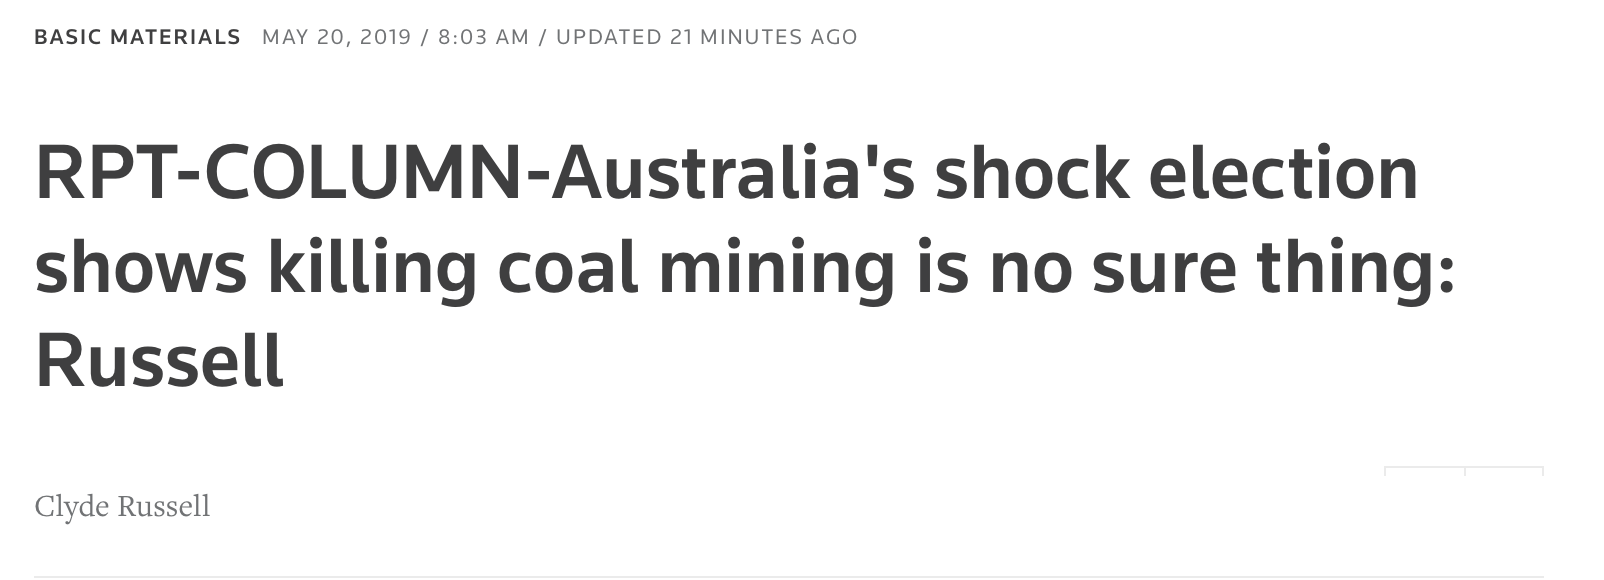 Australia's shock election shows killing coal mining is no sure